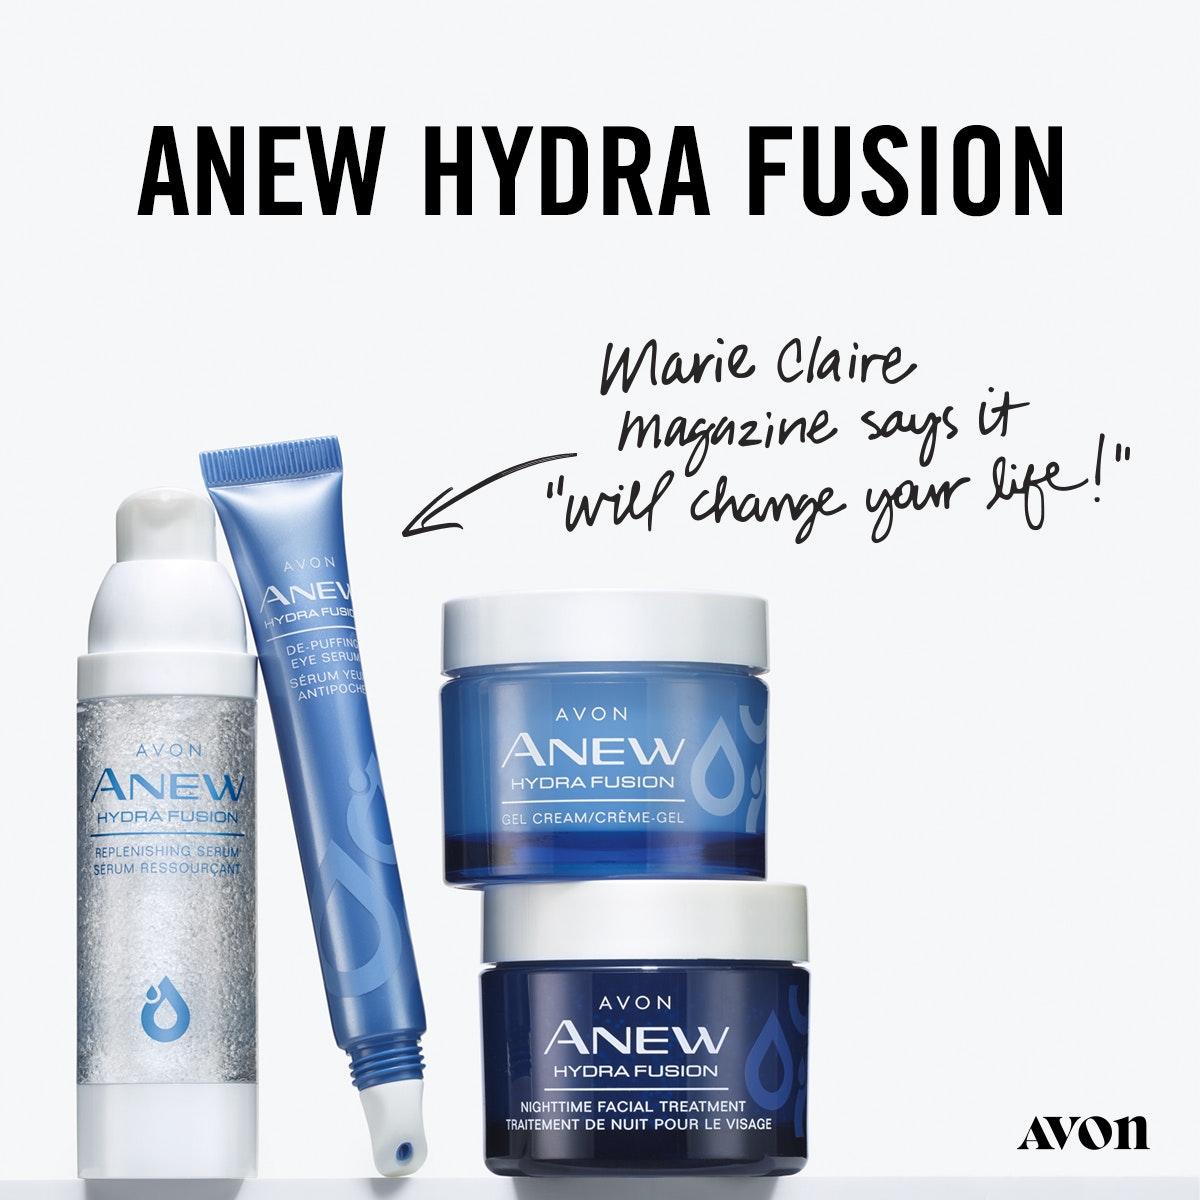 Anew Hydra Fusion unisex skin care